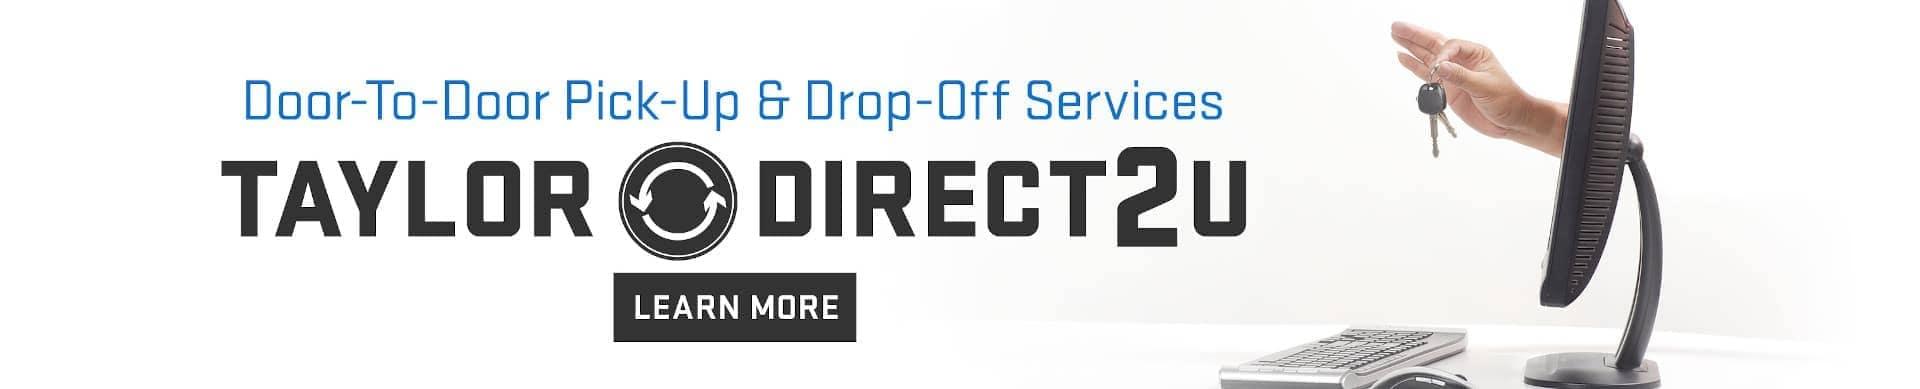 DIRECT2U_rotational_banner-2